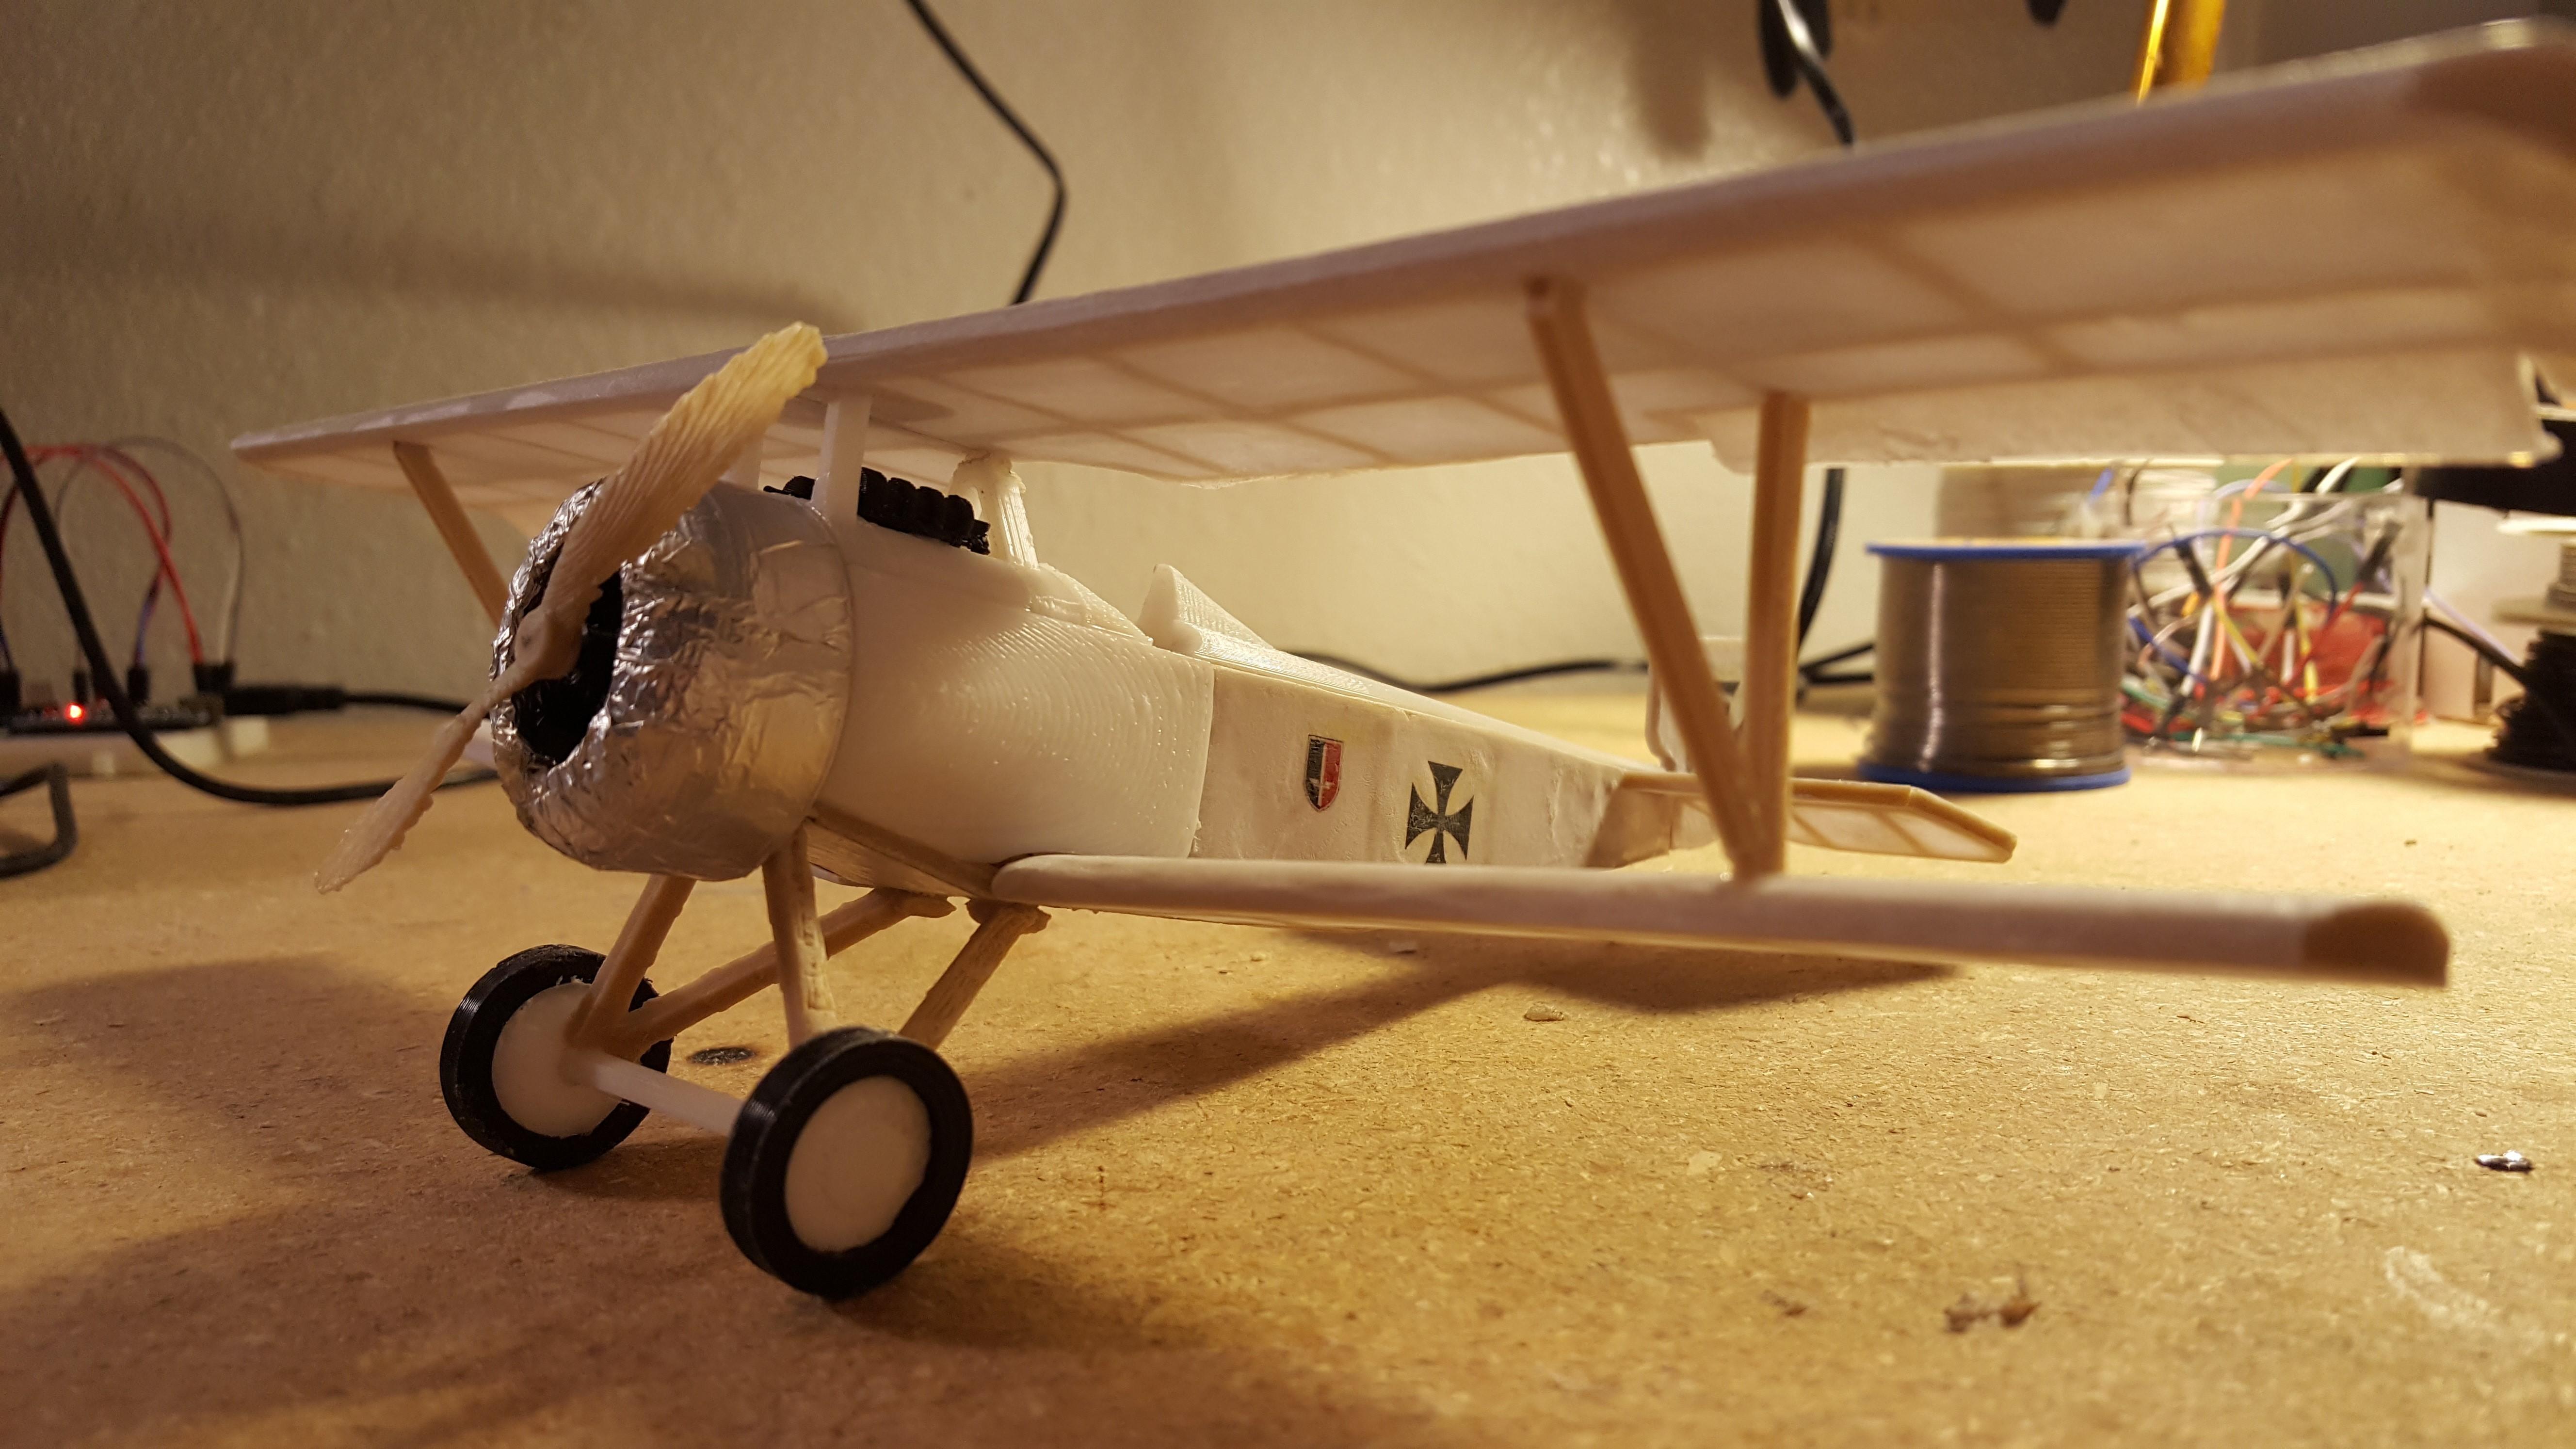 20171014_003619.jpg Download STL file Nieuport 17, WW1 Warplane • 3D printing design, JimmyHo